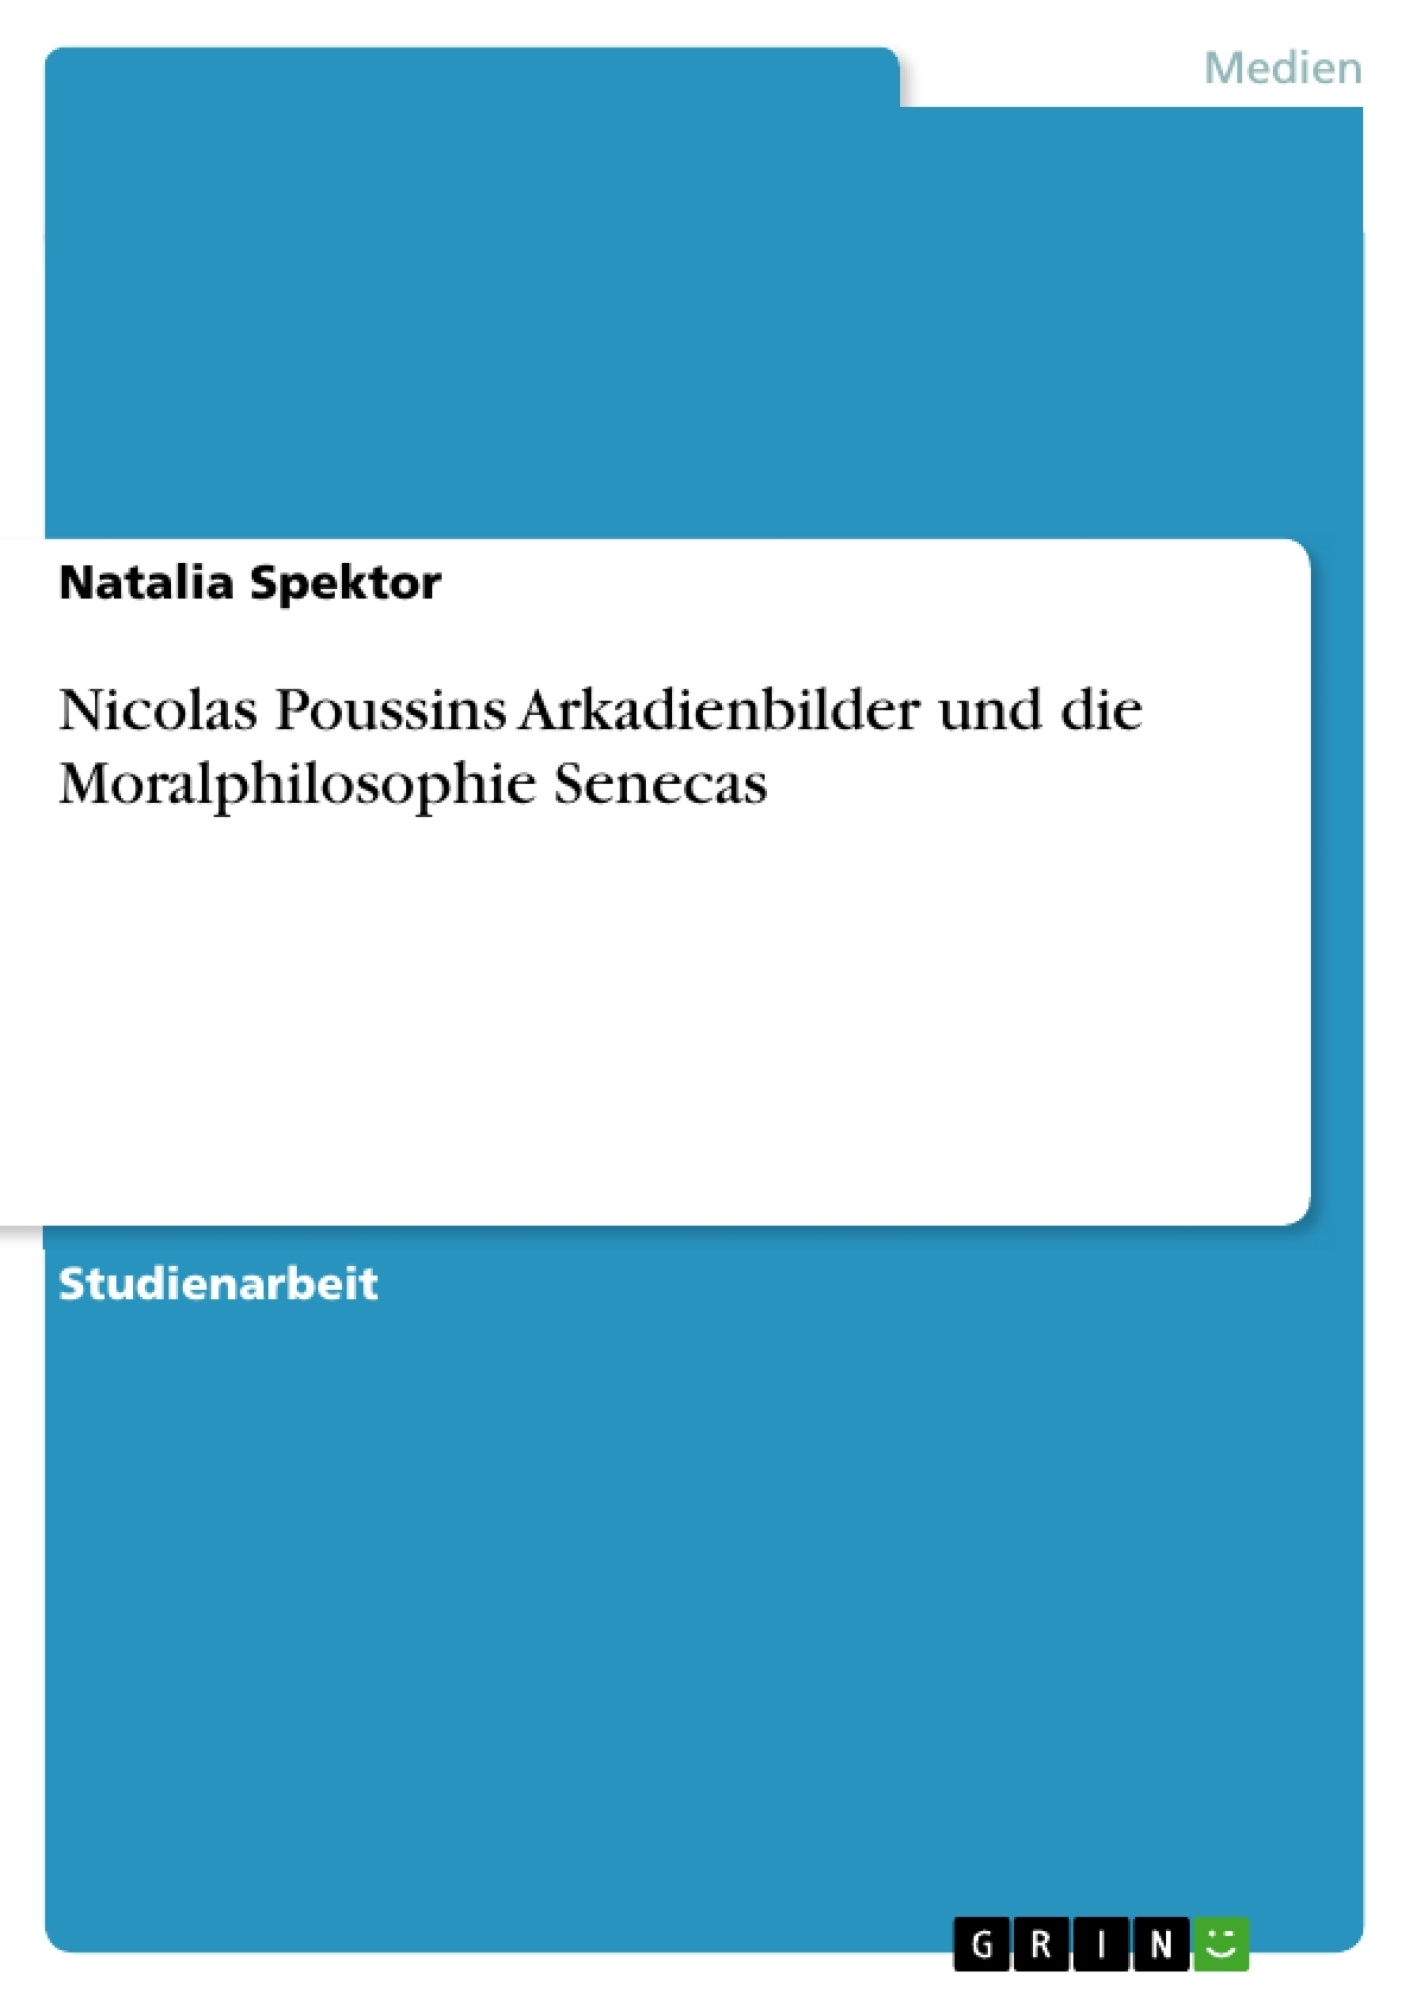 Titel: Nicolas Poussins Arkadienbilder und die Moralphilosophie Senecas